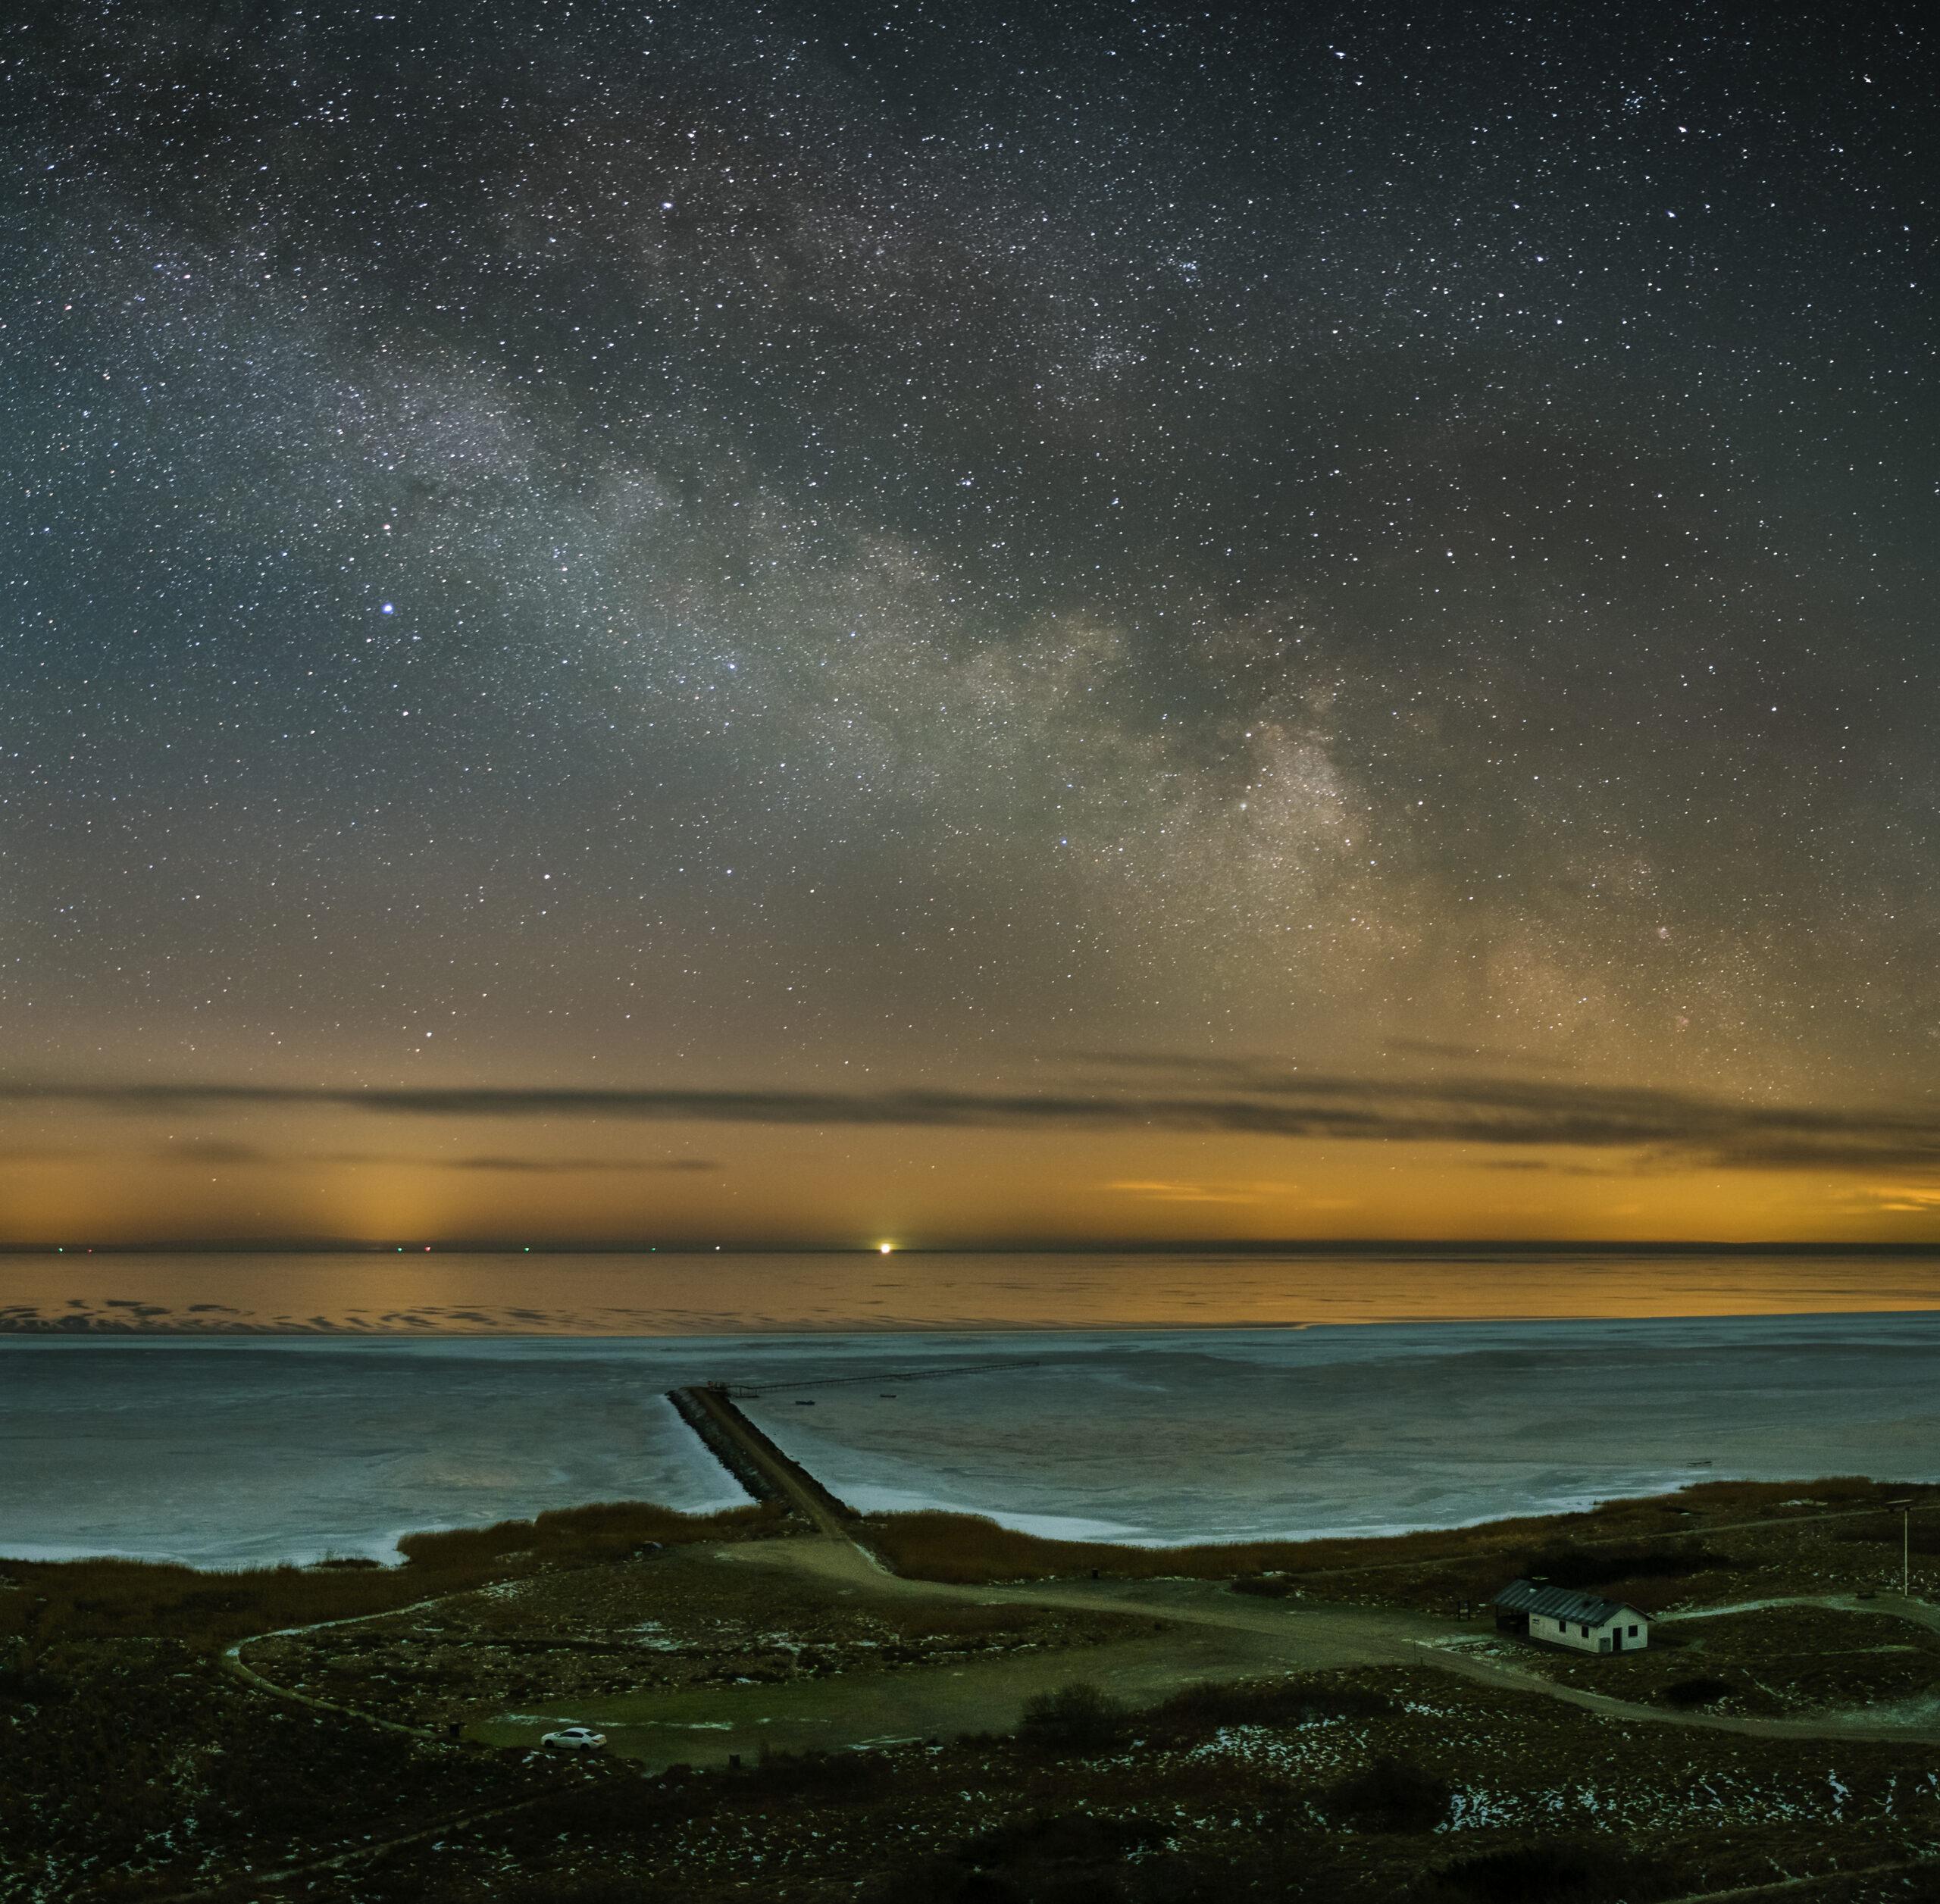 Milky Way on a frosty night